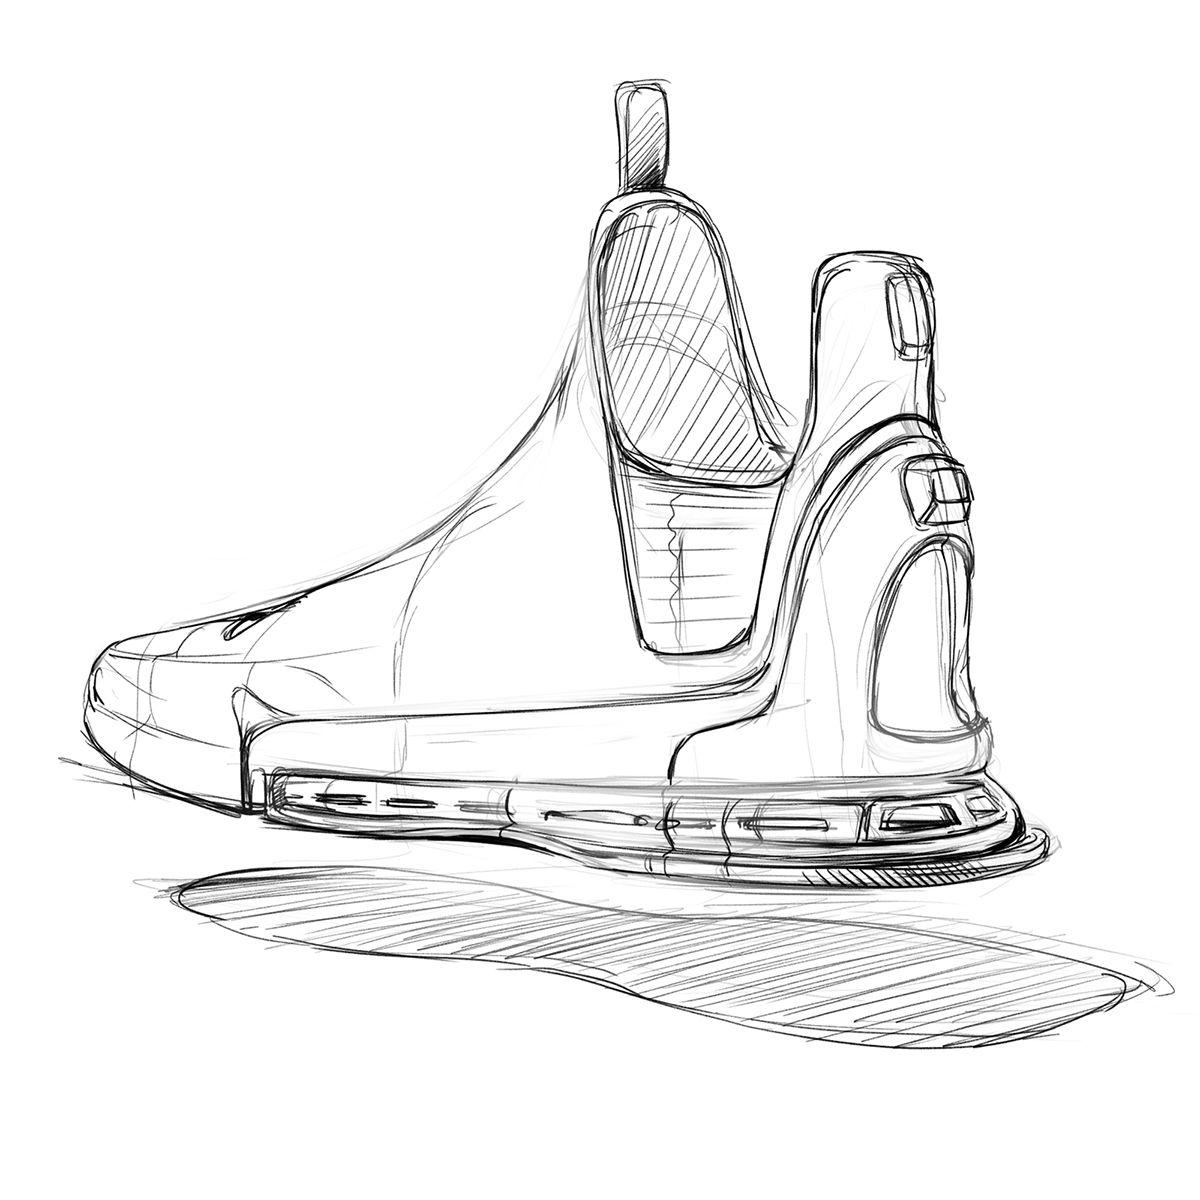 Some doodles on Behance | Sketching | Pinterest | Behance ...